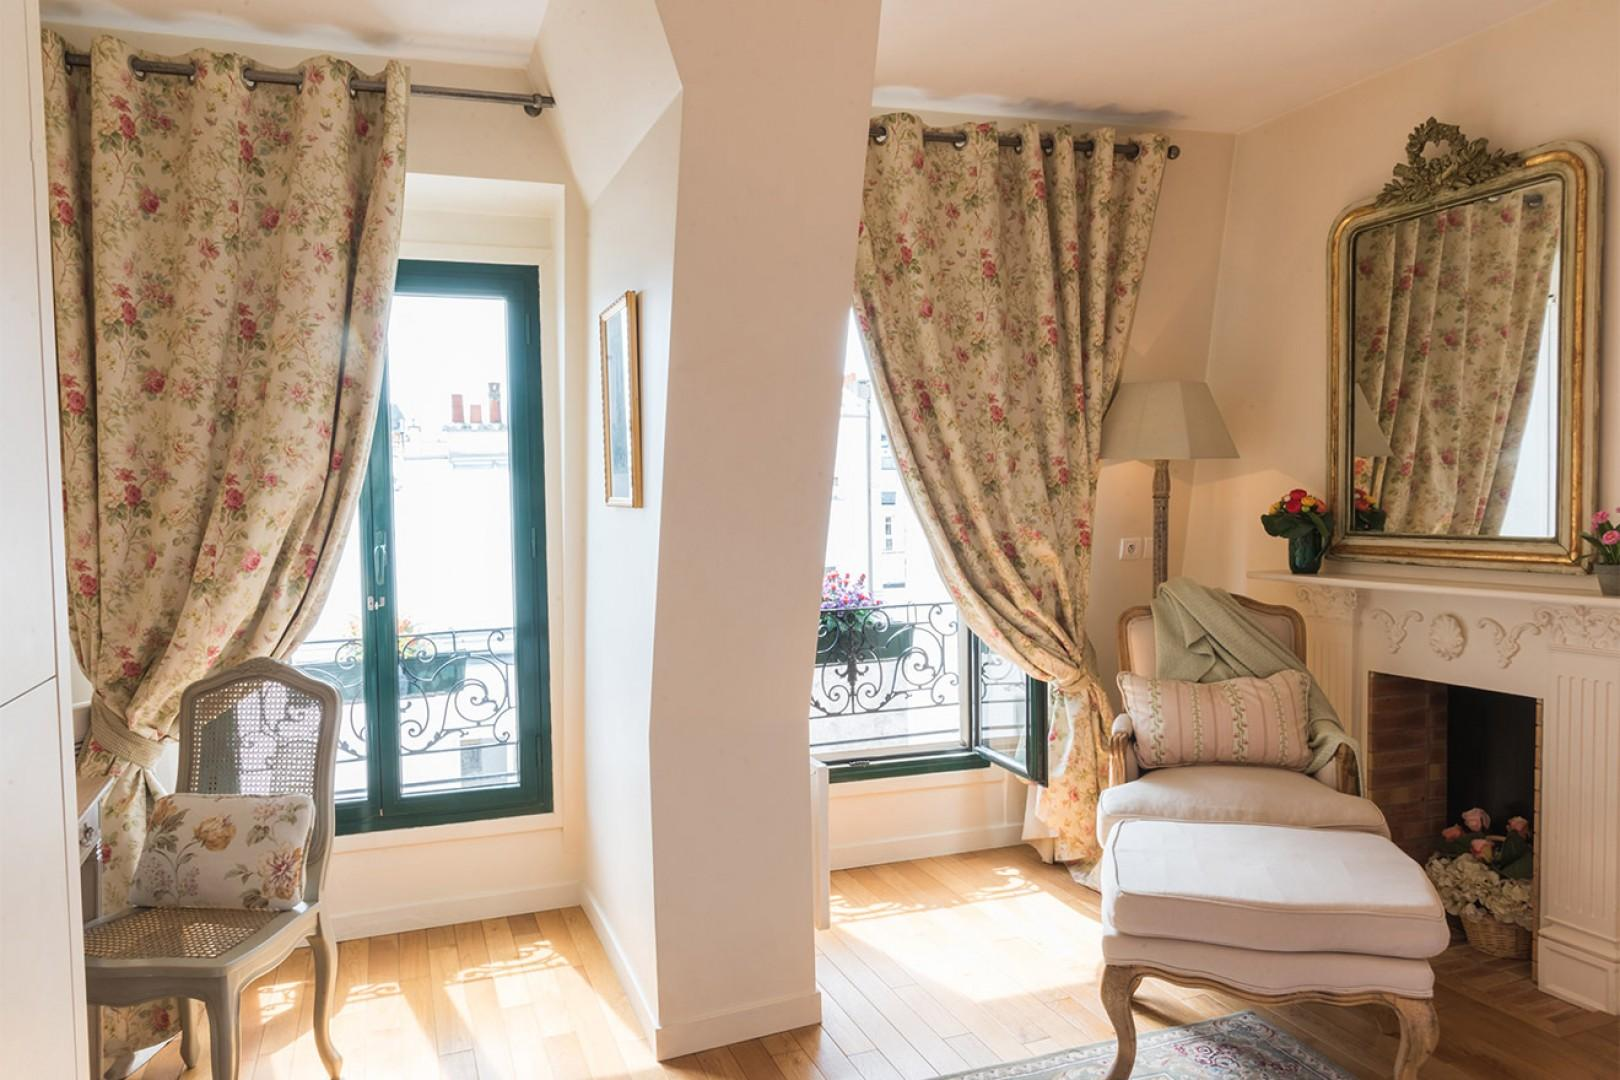 Large French windows in bedroom provide plenty of sunlight.